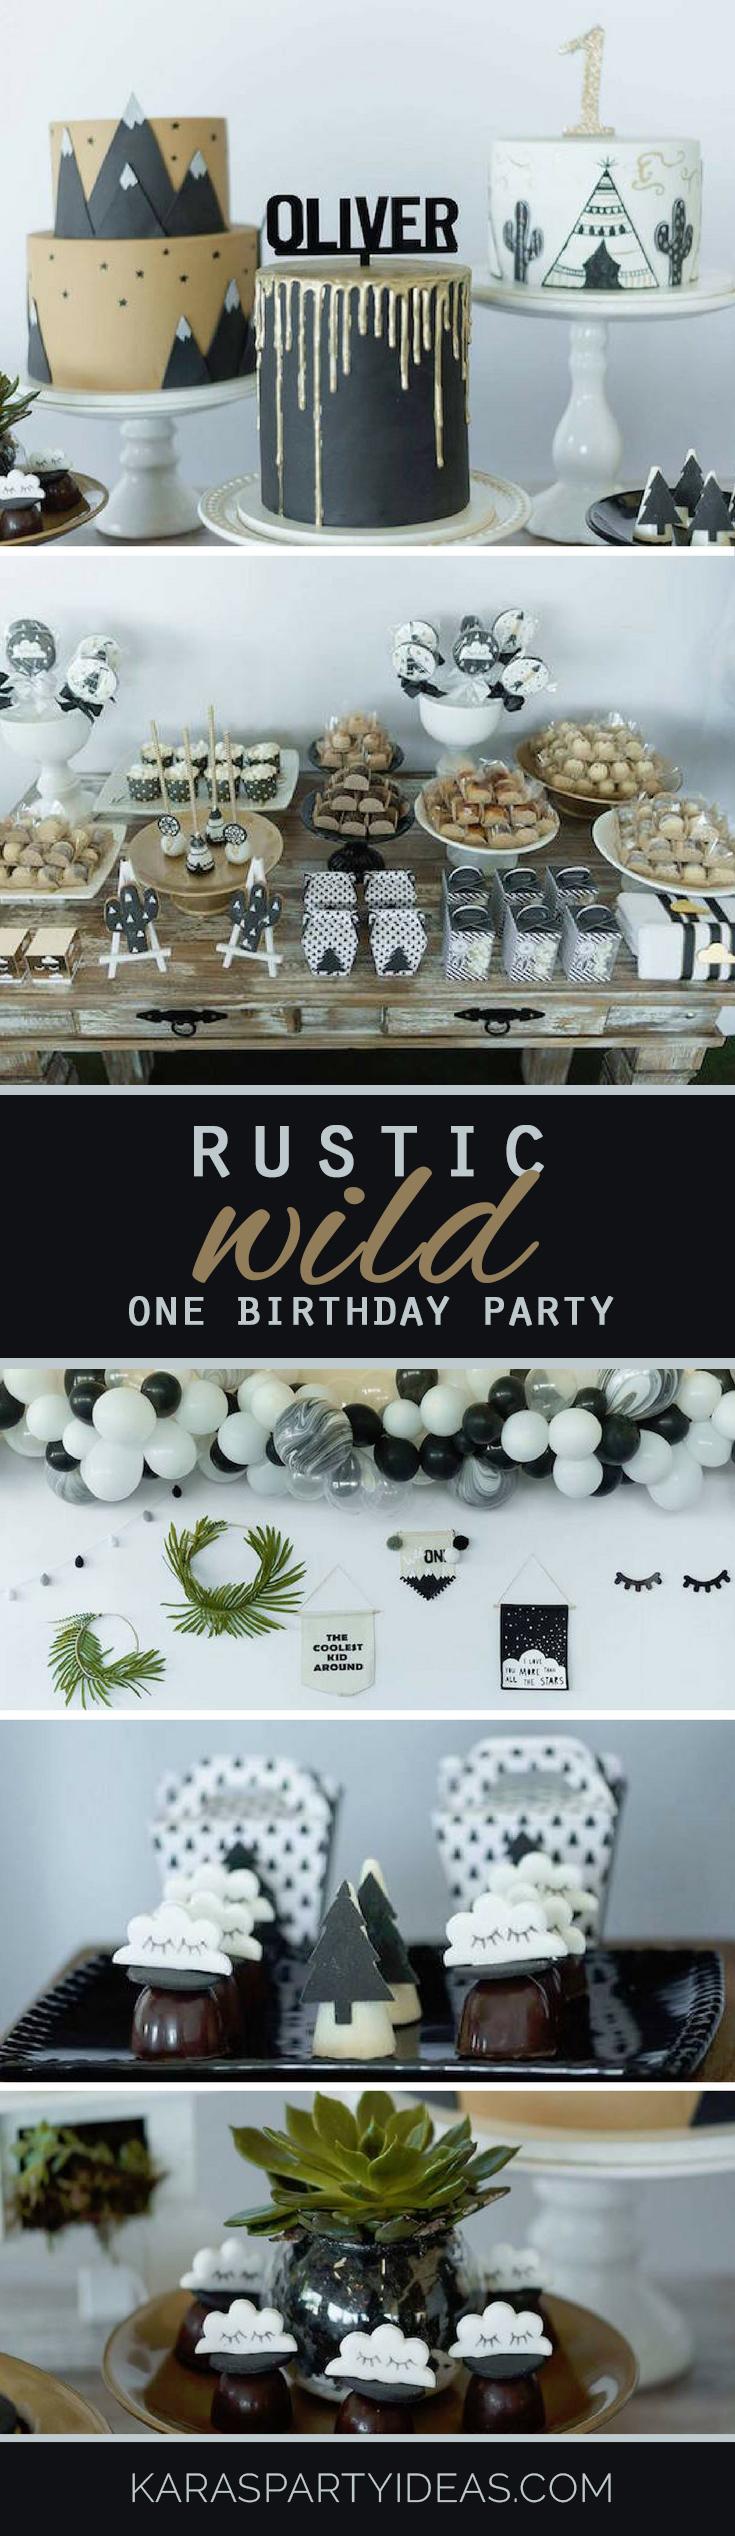 rustic wild one birthday party via Kara's Party Ideas